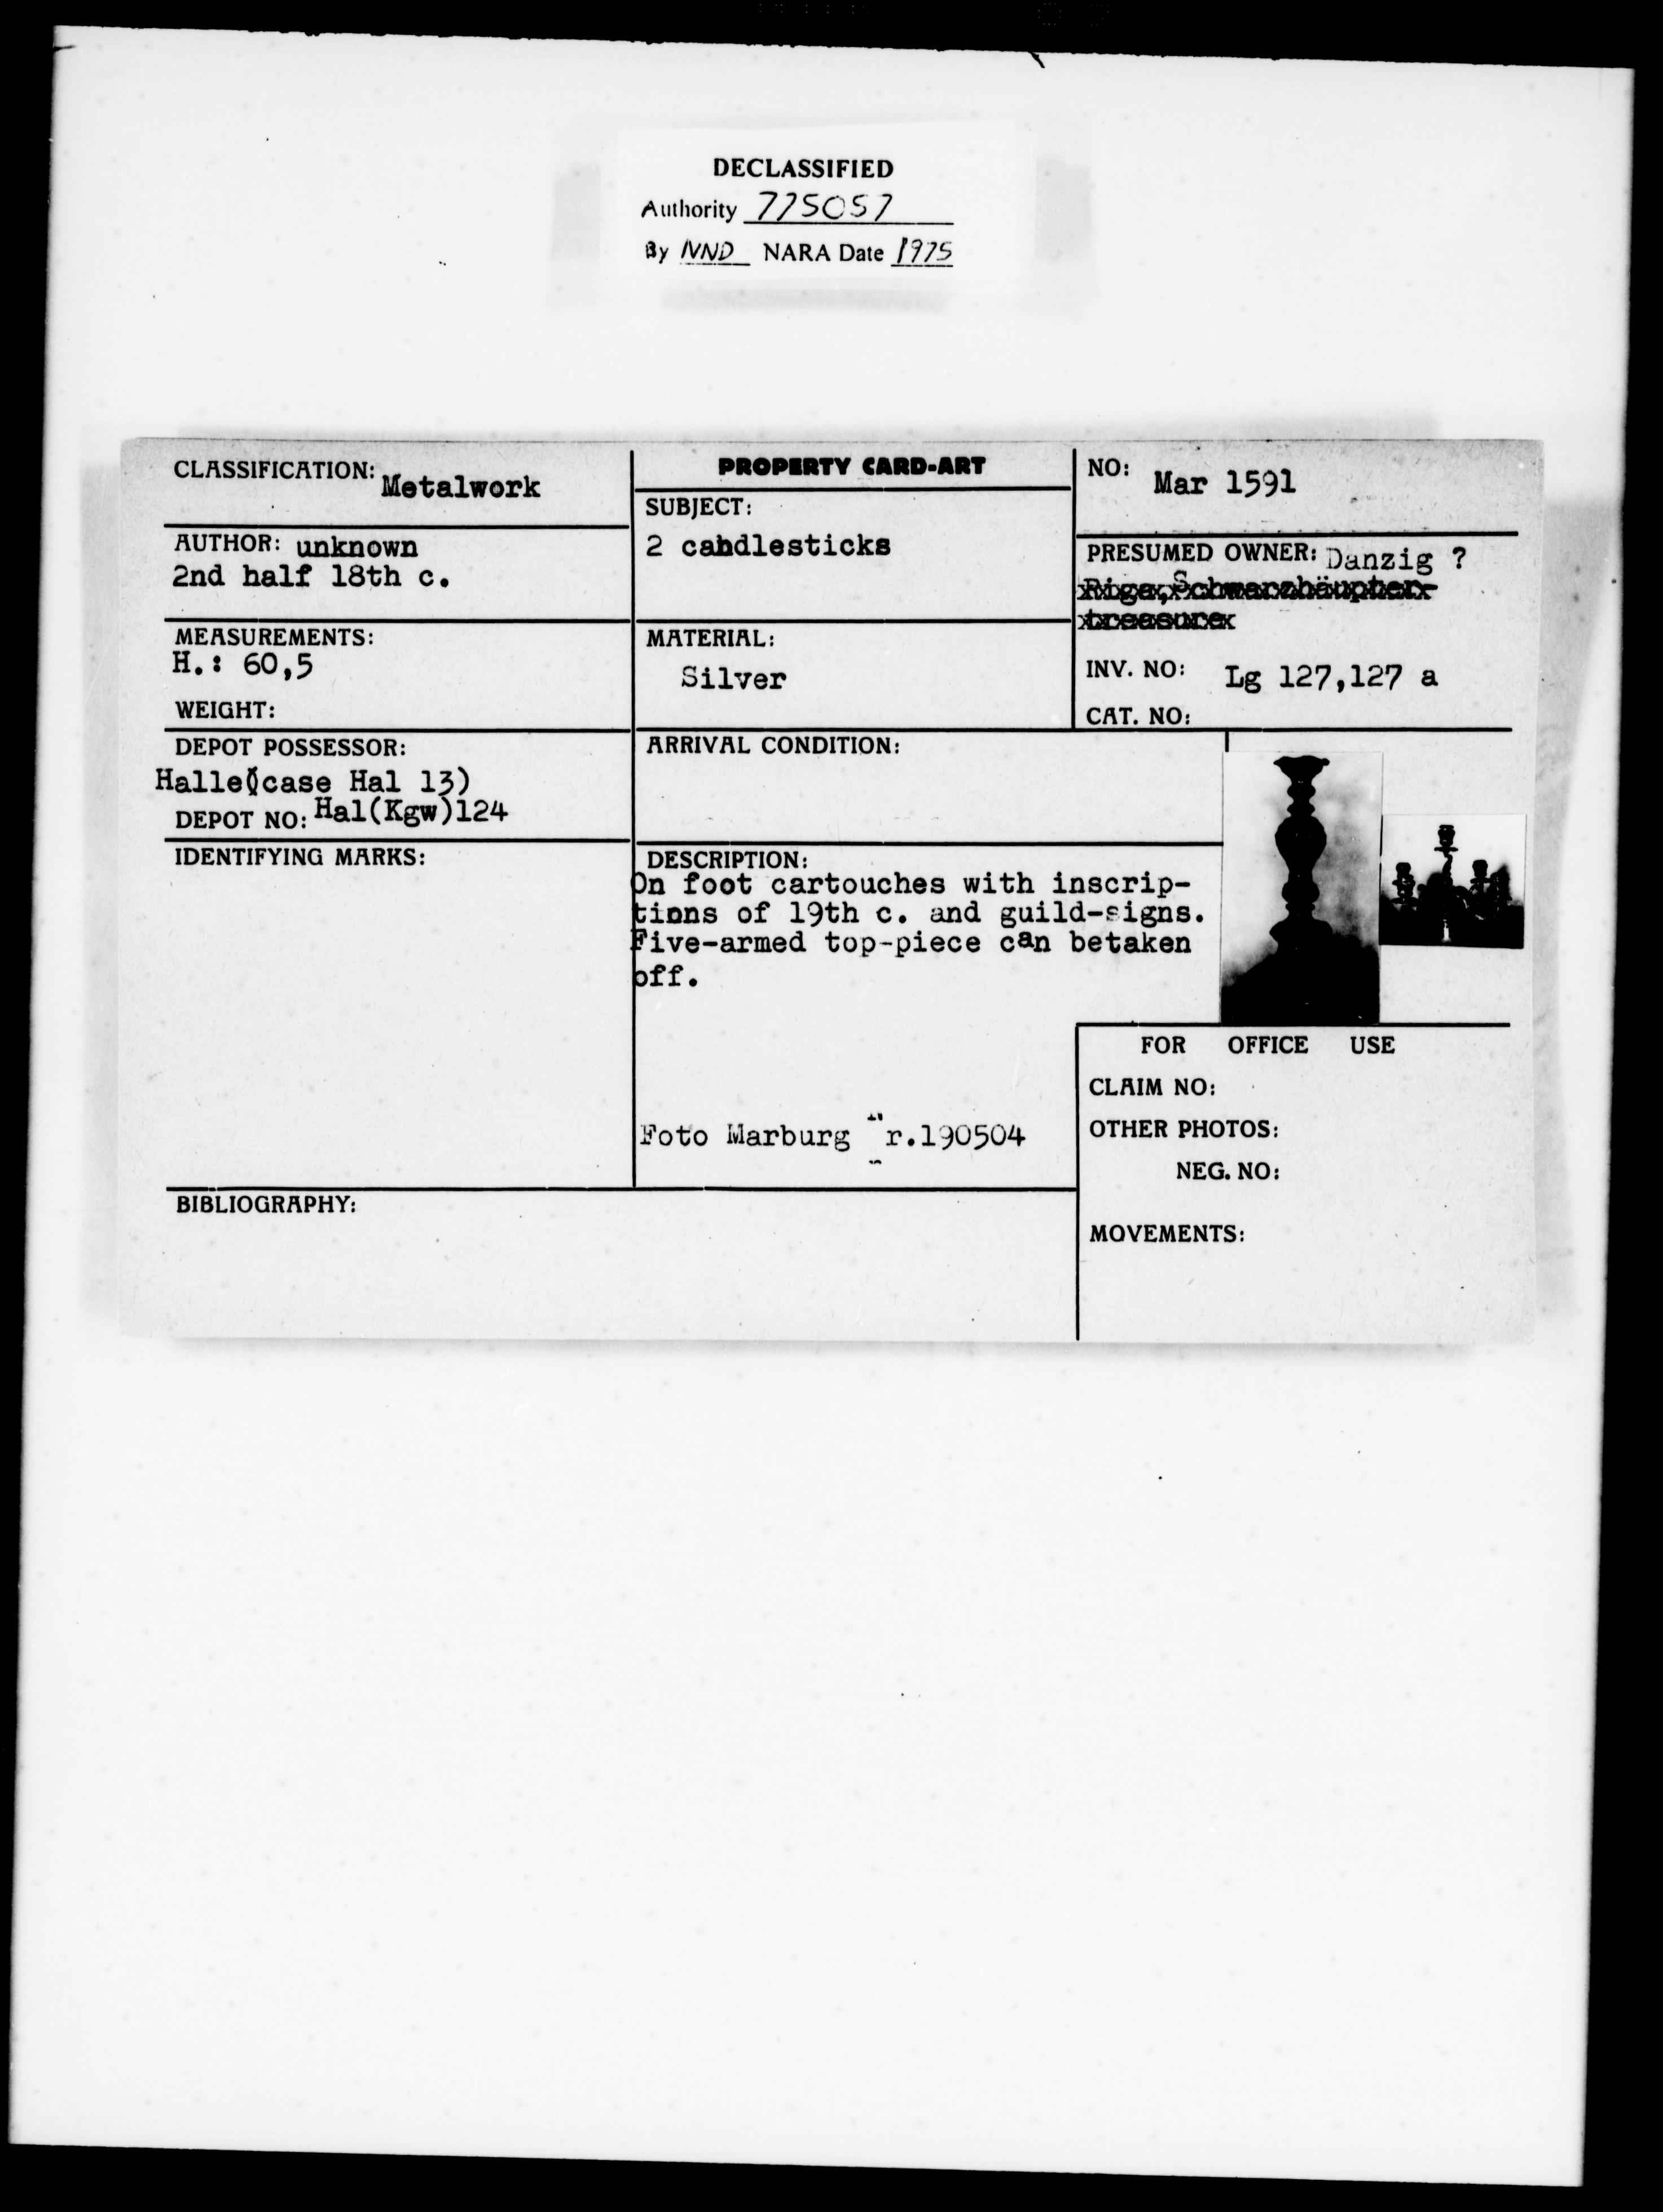 Property Card Mar 1591, Metalwork, 2 Candlesticks